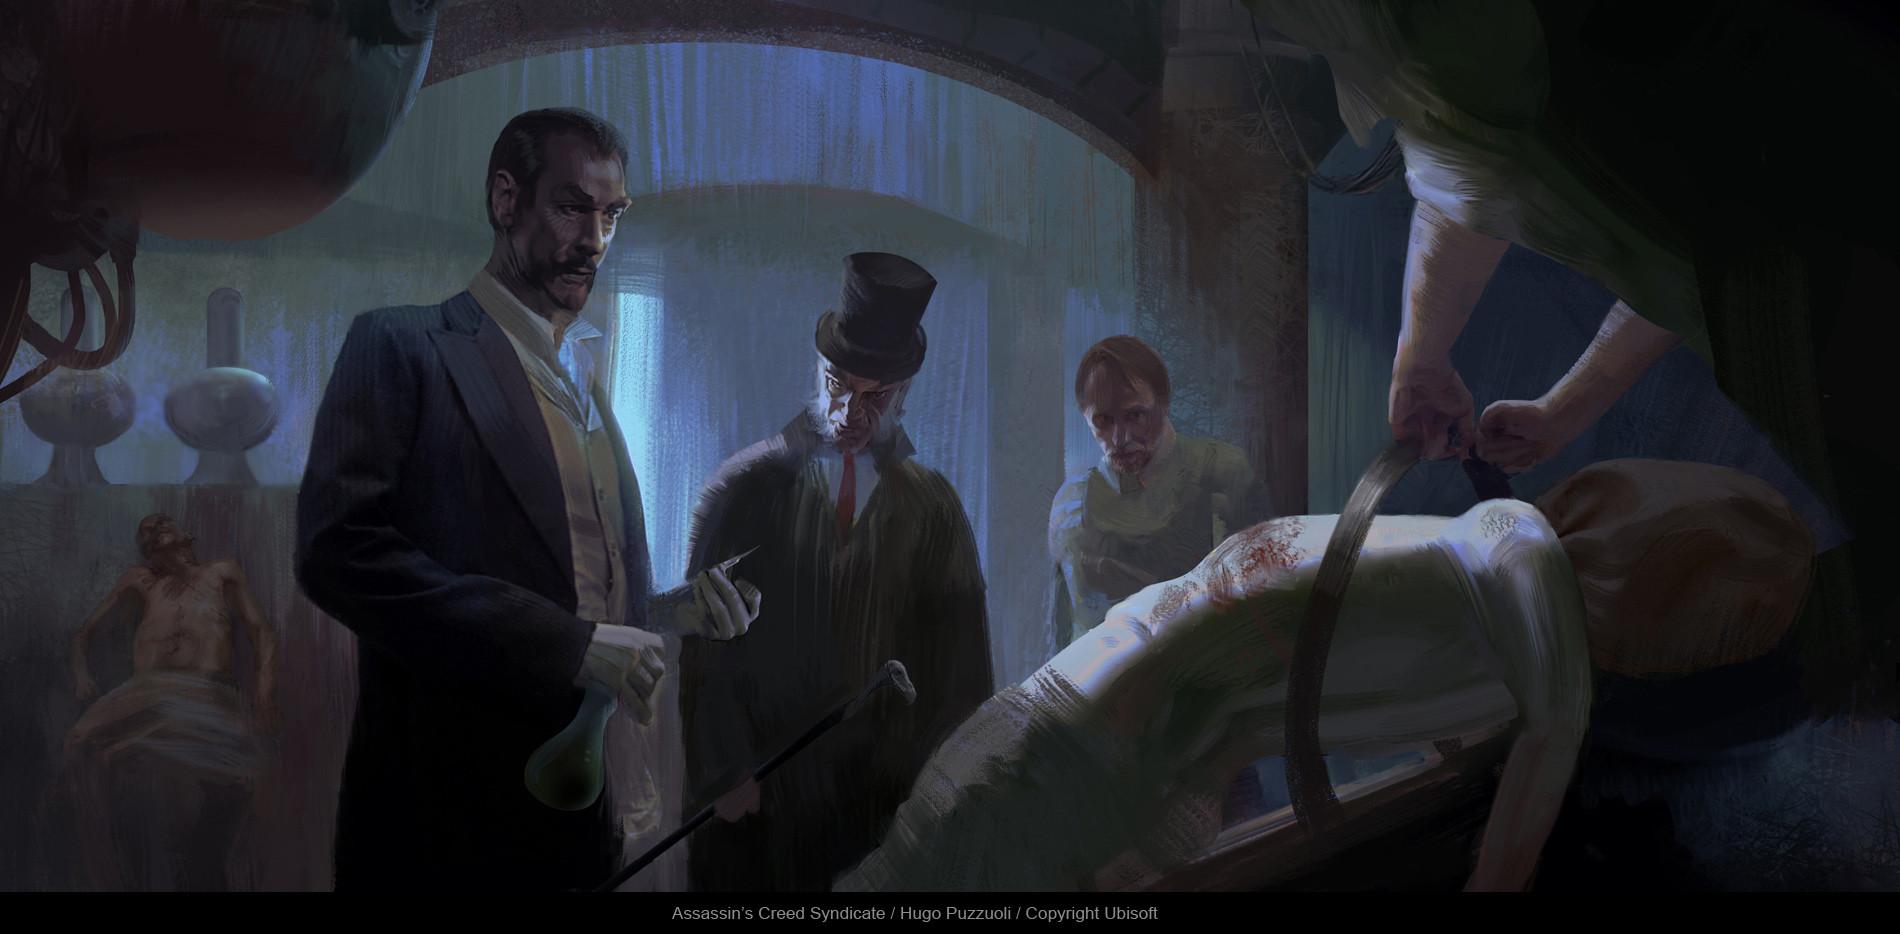 Hugo puzzuoli acvi ev templar medicines hpuzzuoli